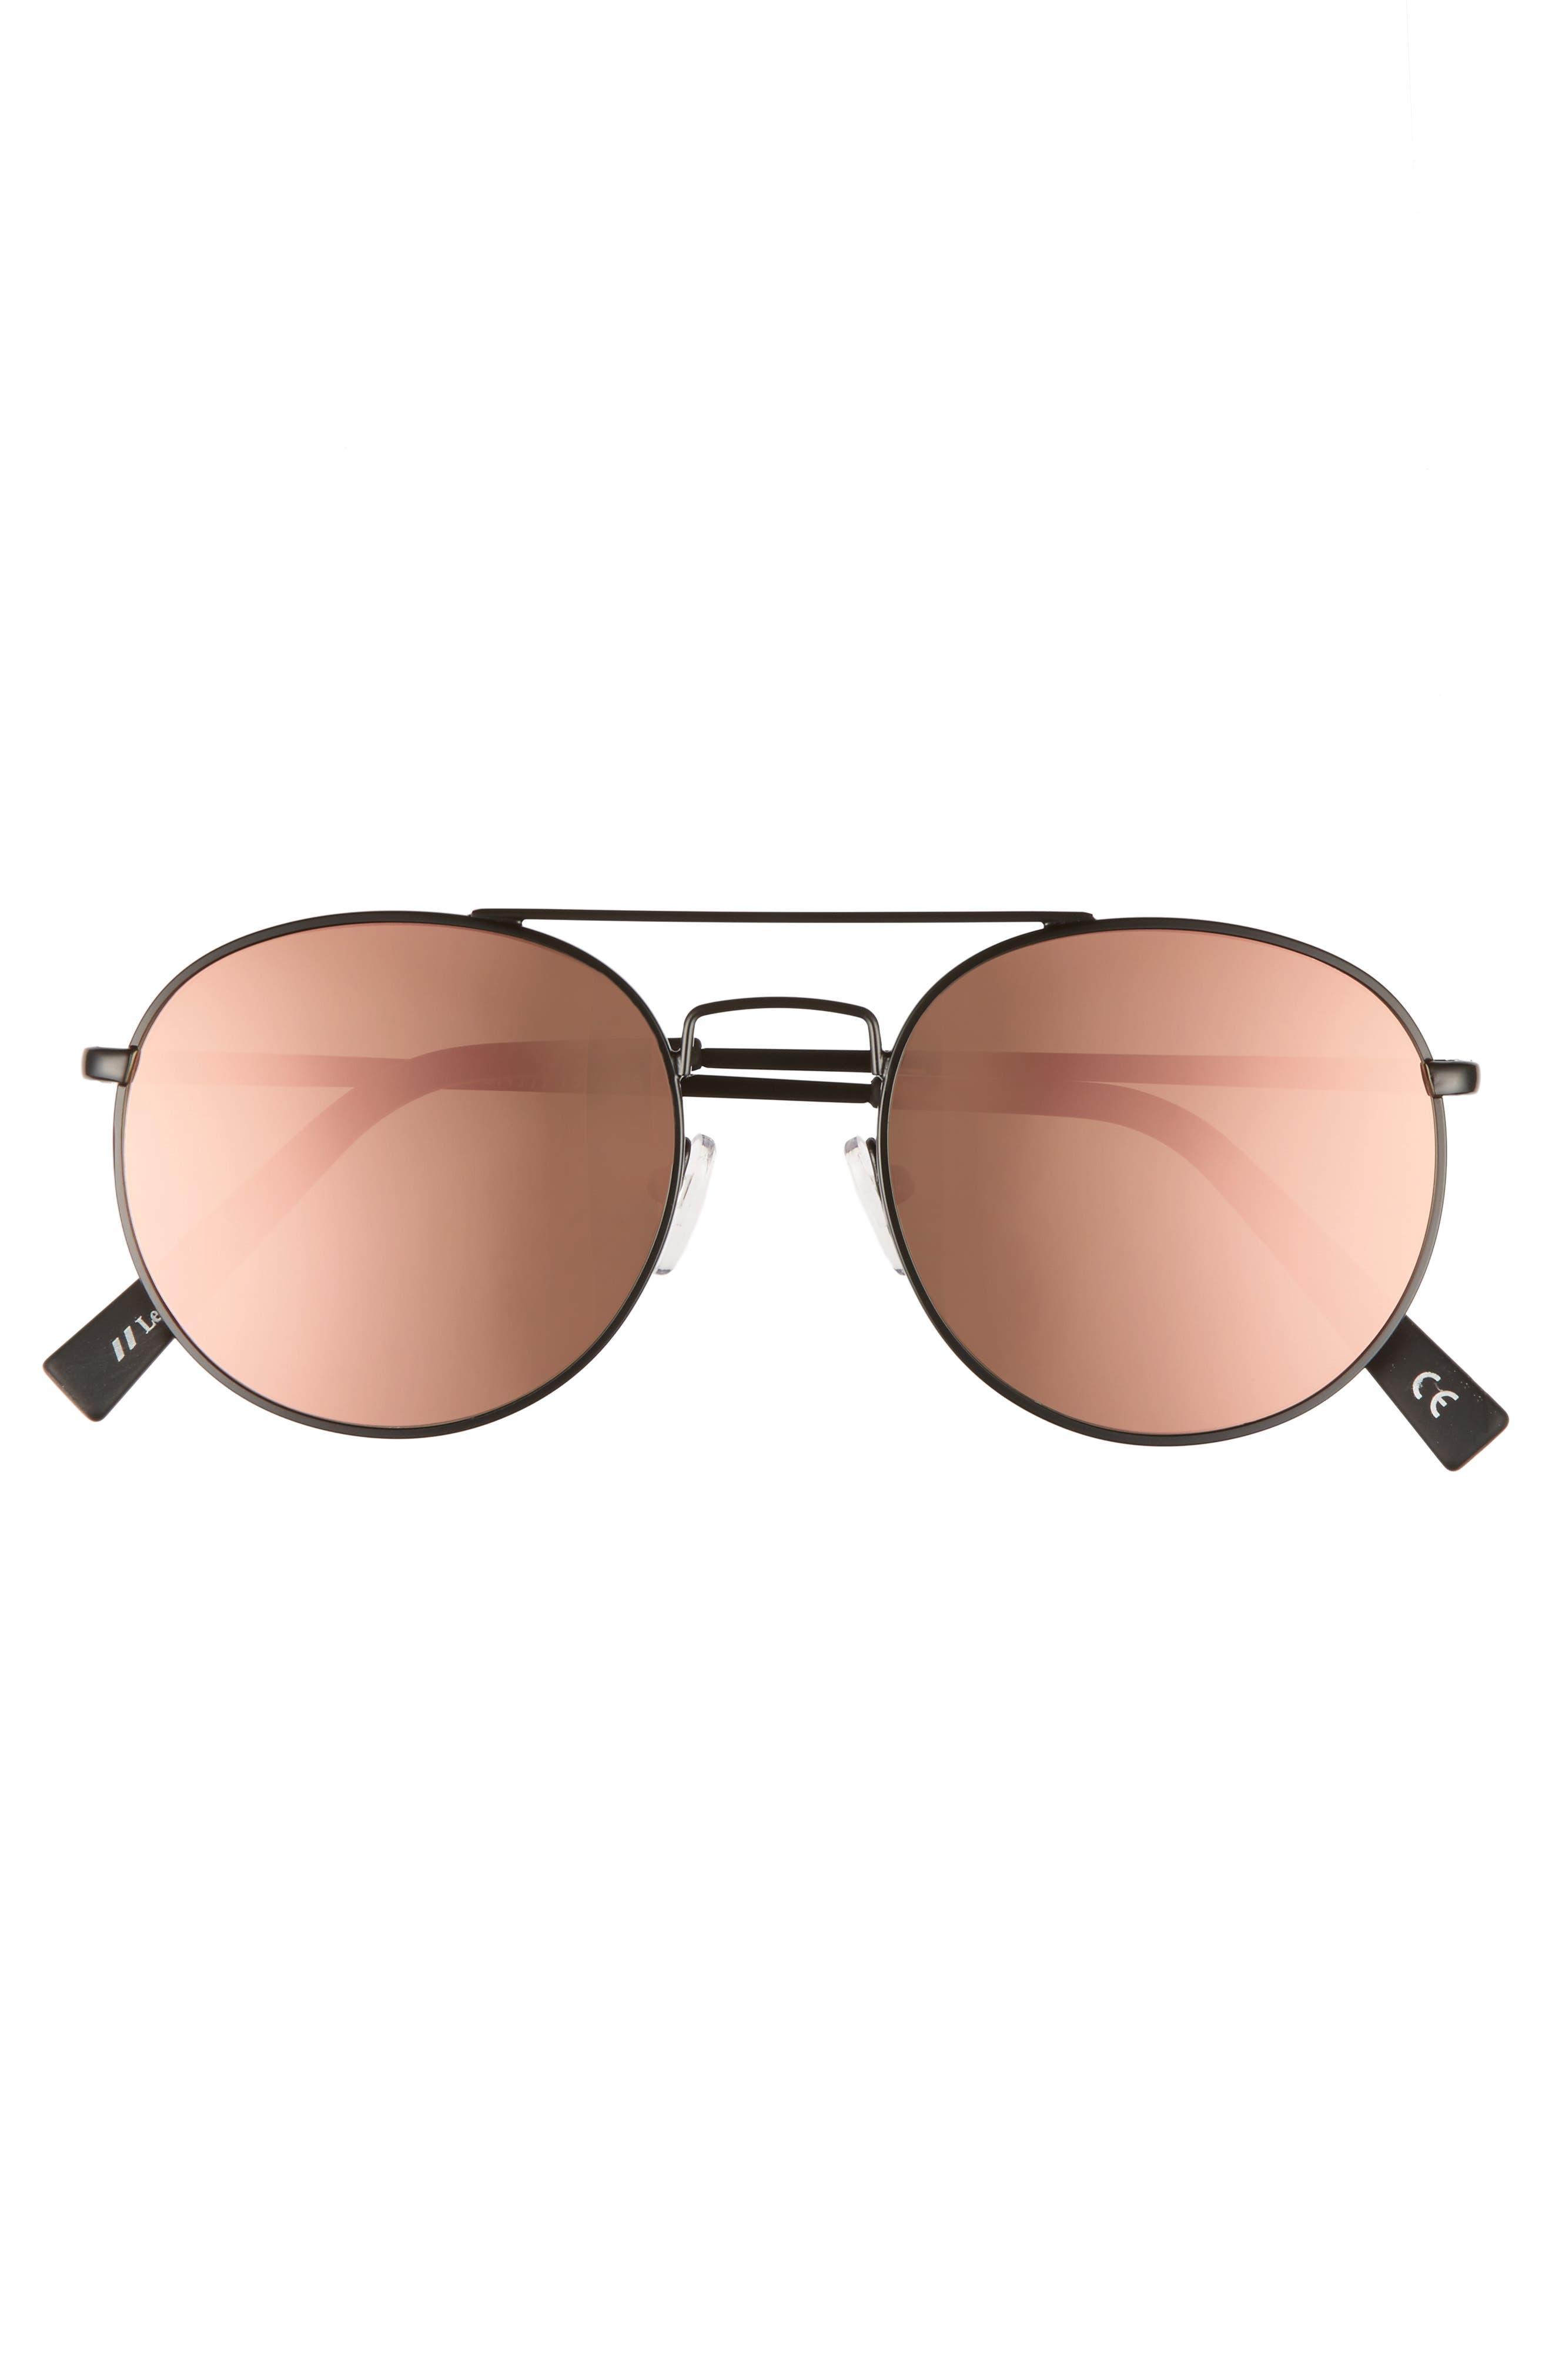 Revolution 53mm Aviator Sunglasses,                             Alternate thumbnail 3, color,                             001